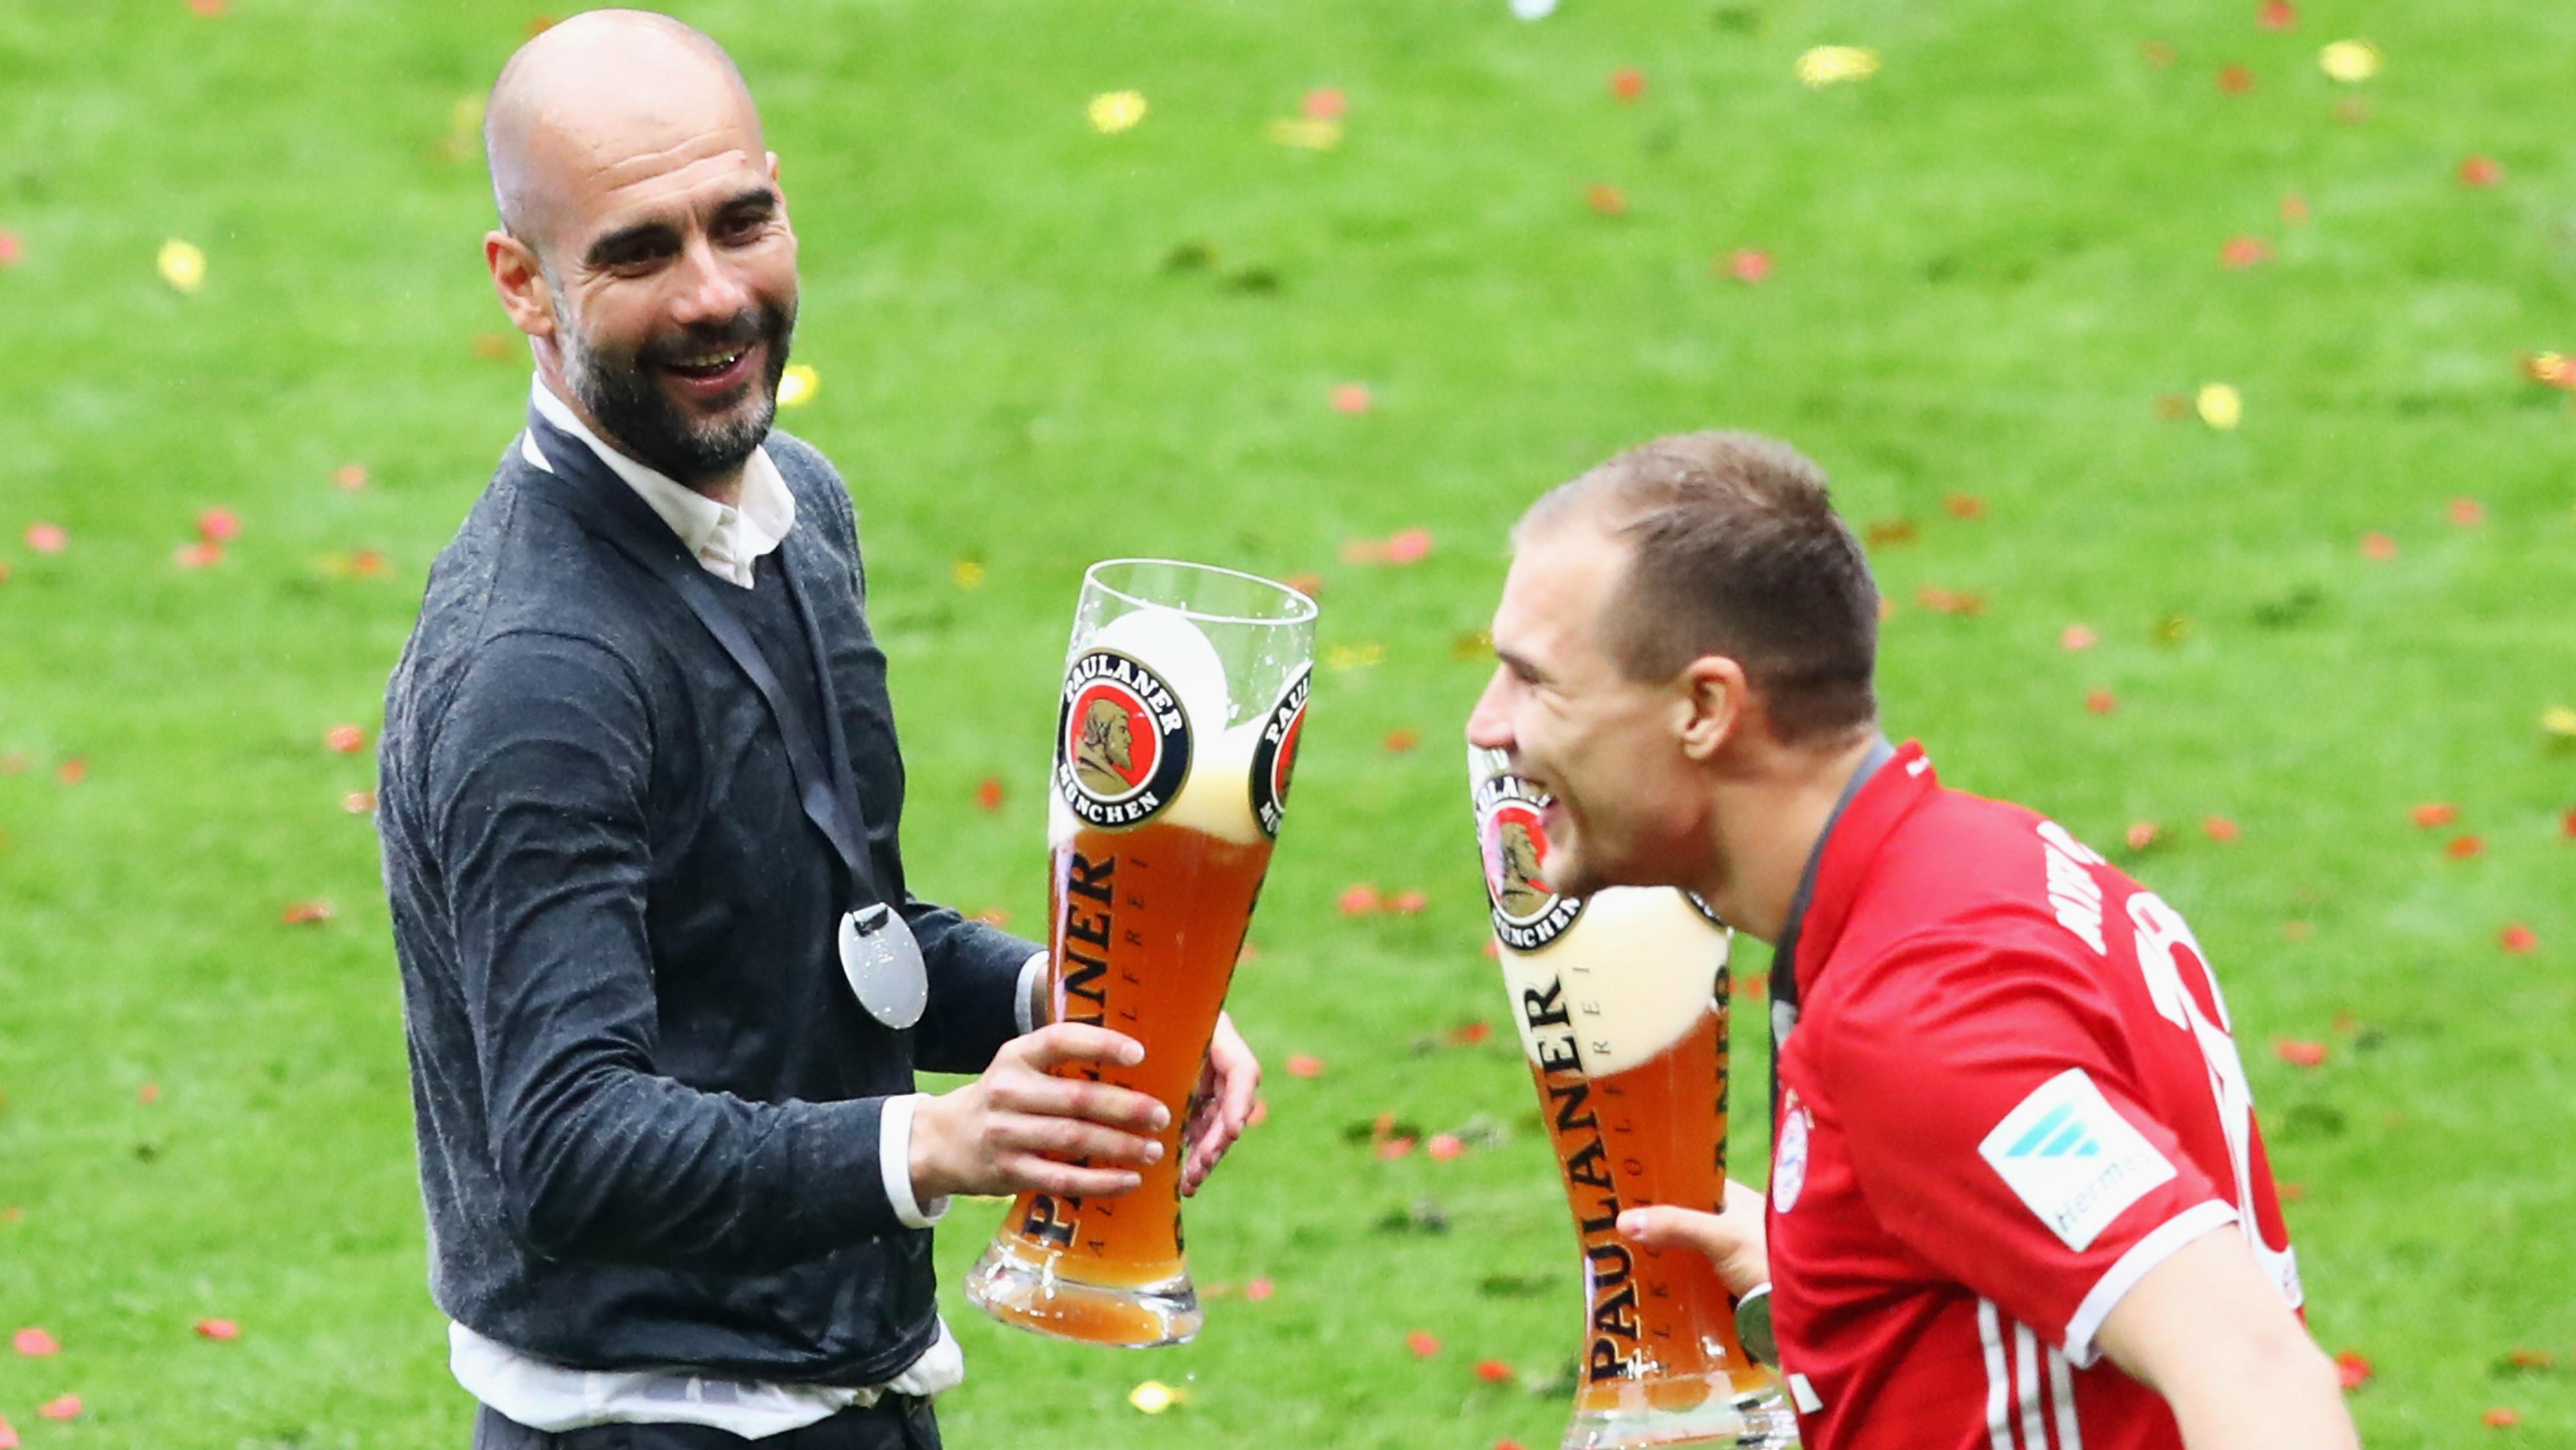 Mehrere Monate Pause: Bayerns Tolisso erleidet Kreuzbandriss